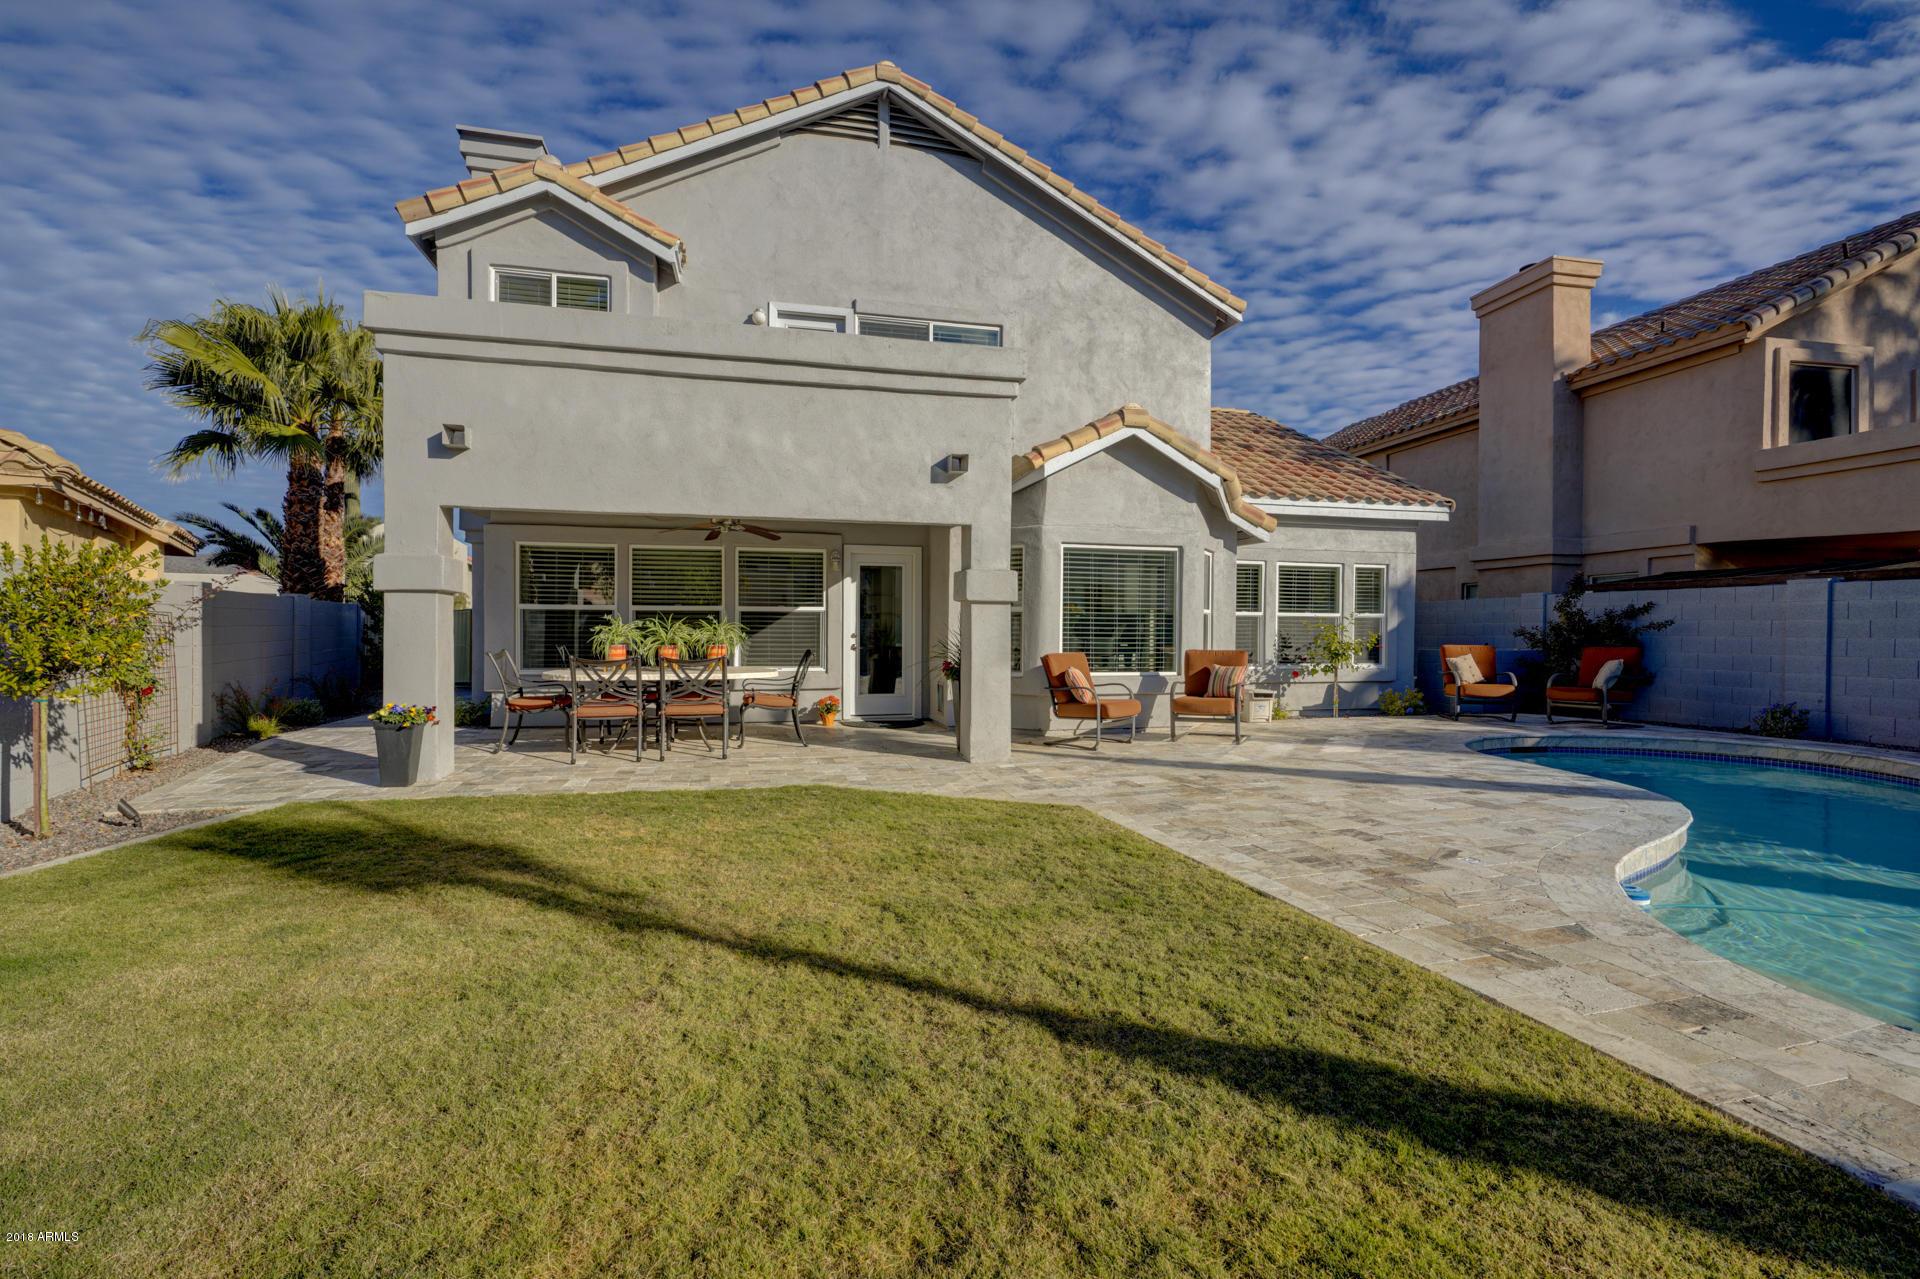 MLS 5854948 3747 E TANGLEWOOD Drive, Phoenix, AZ 85048 Ahwatukee Community AZ Lake Subdivision